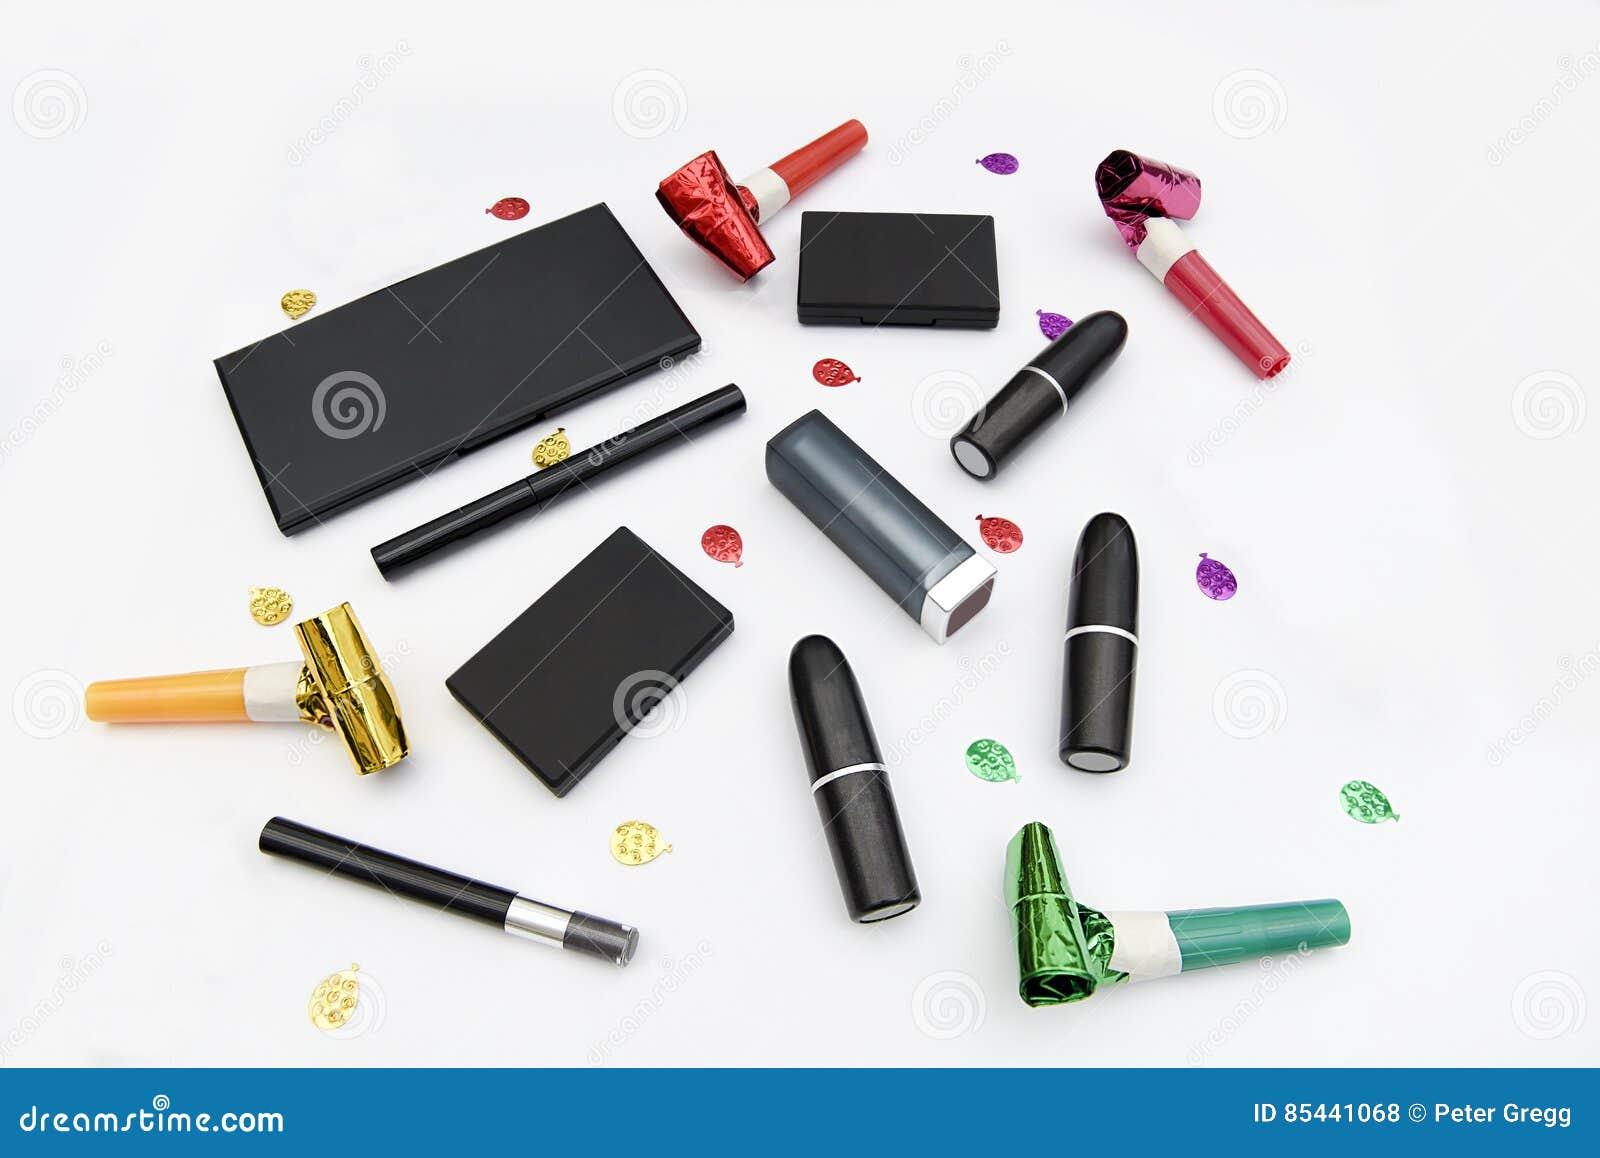 Assorted makeup items